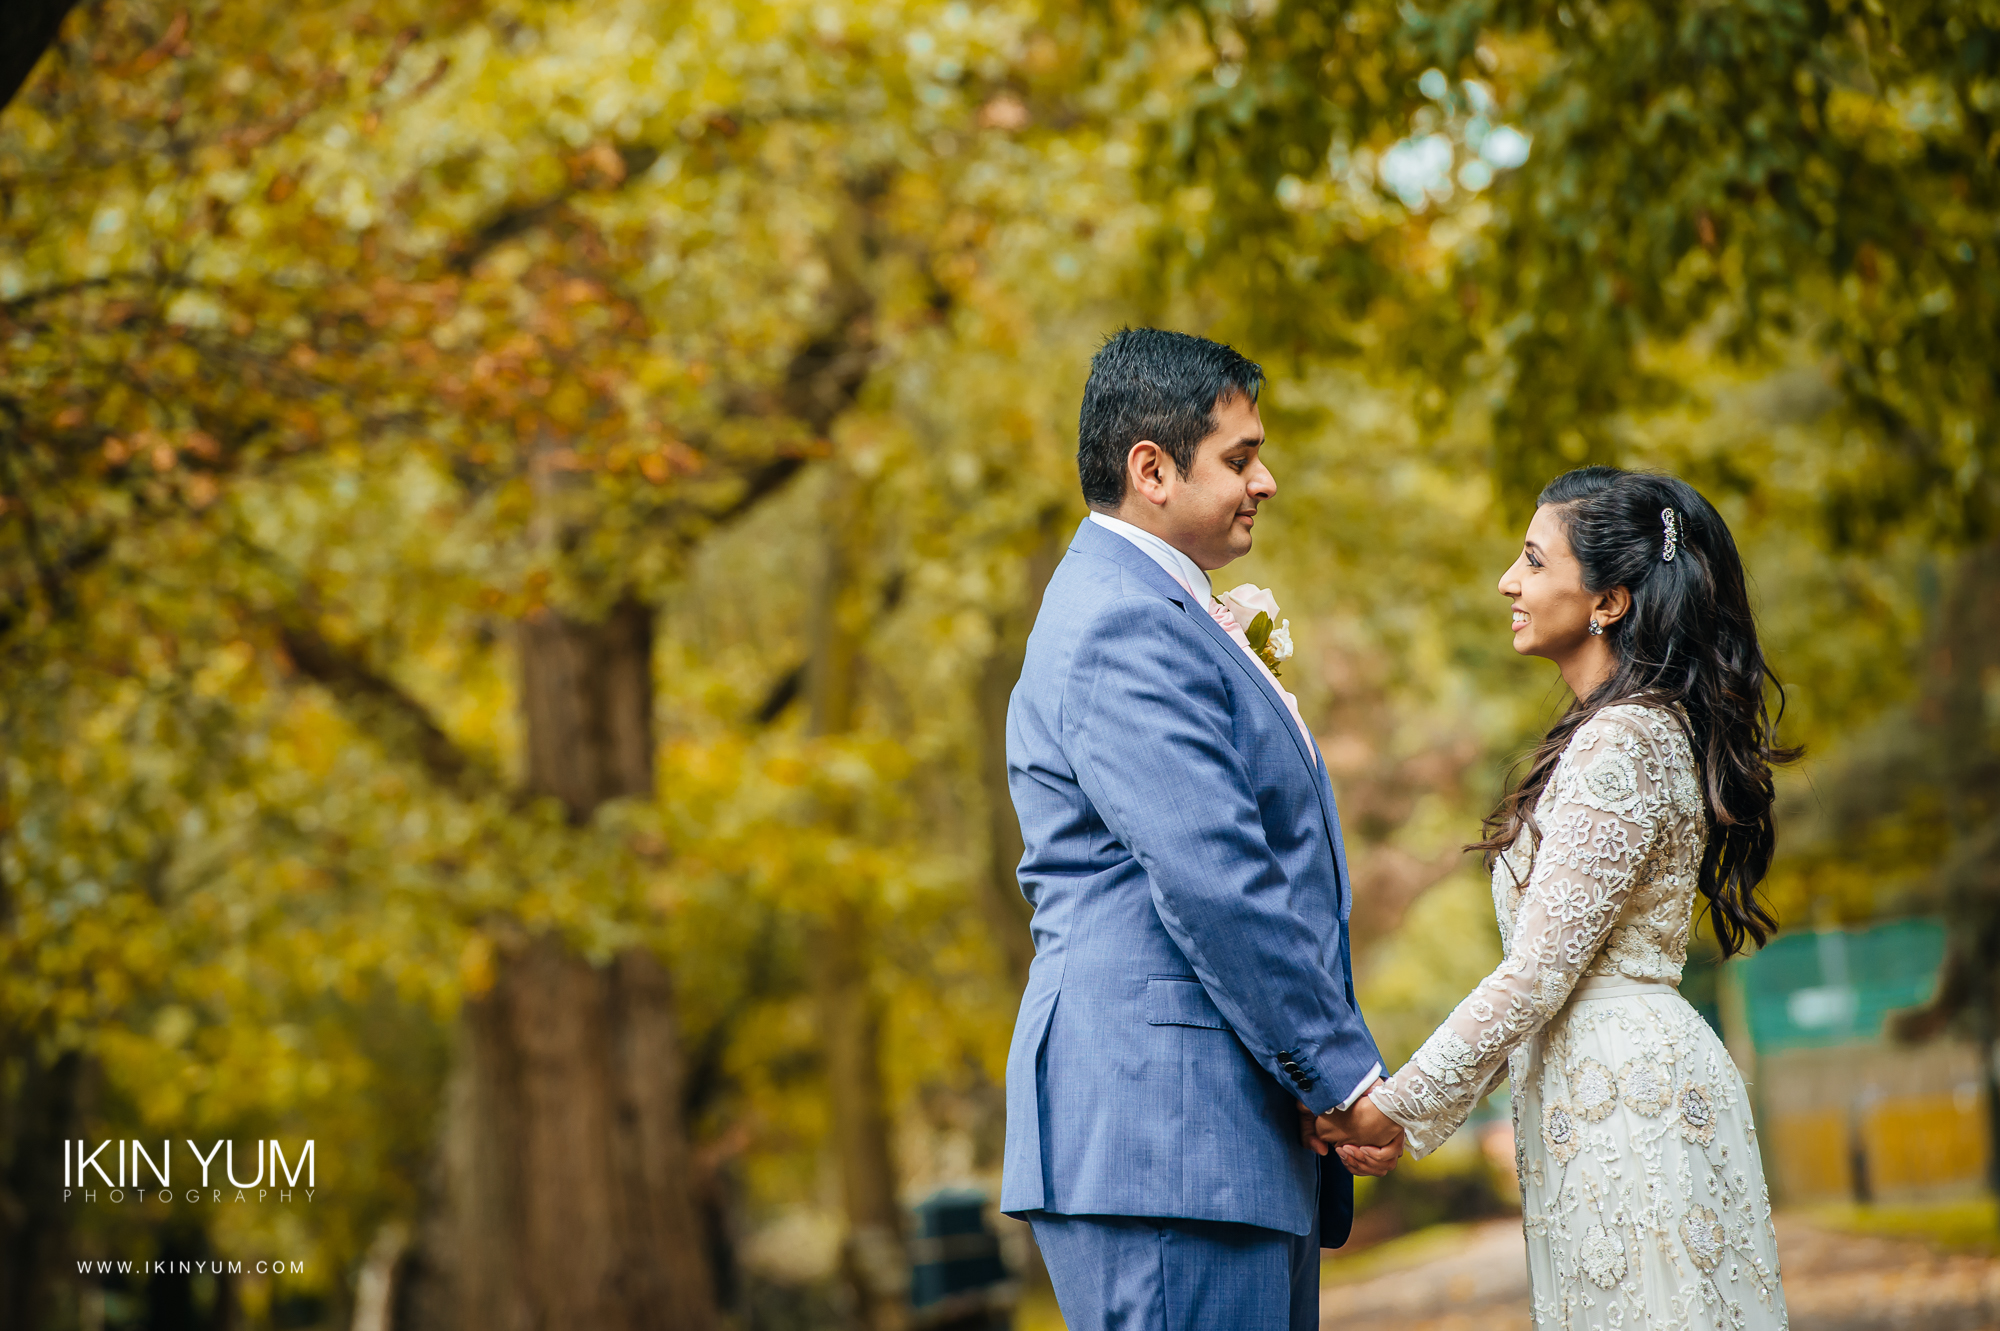 The Great Barn Wedding - London Asian Wedding Photographer